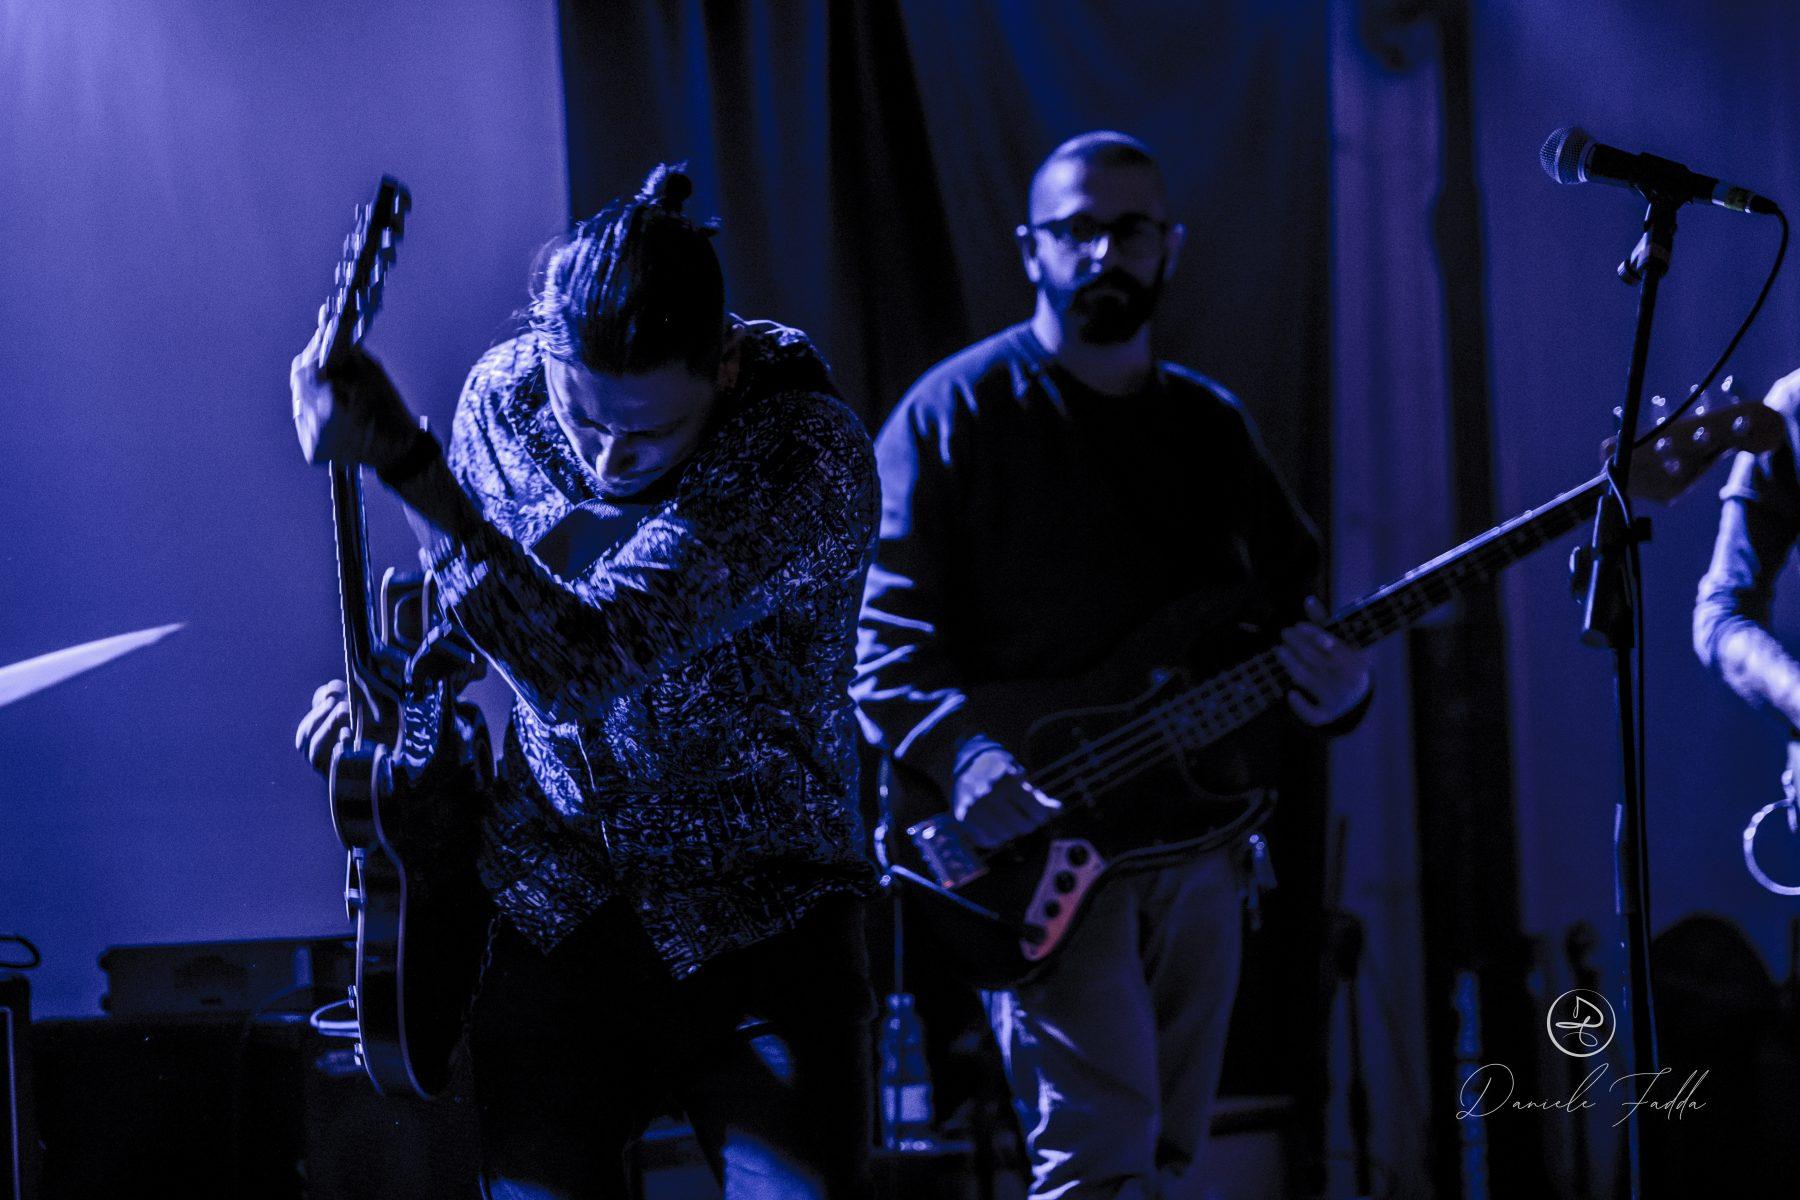 kme - live report - la pioggia - daniele fadda - sa scena sarda - 2019 - karel music expo